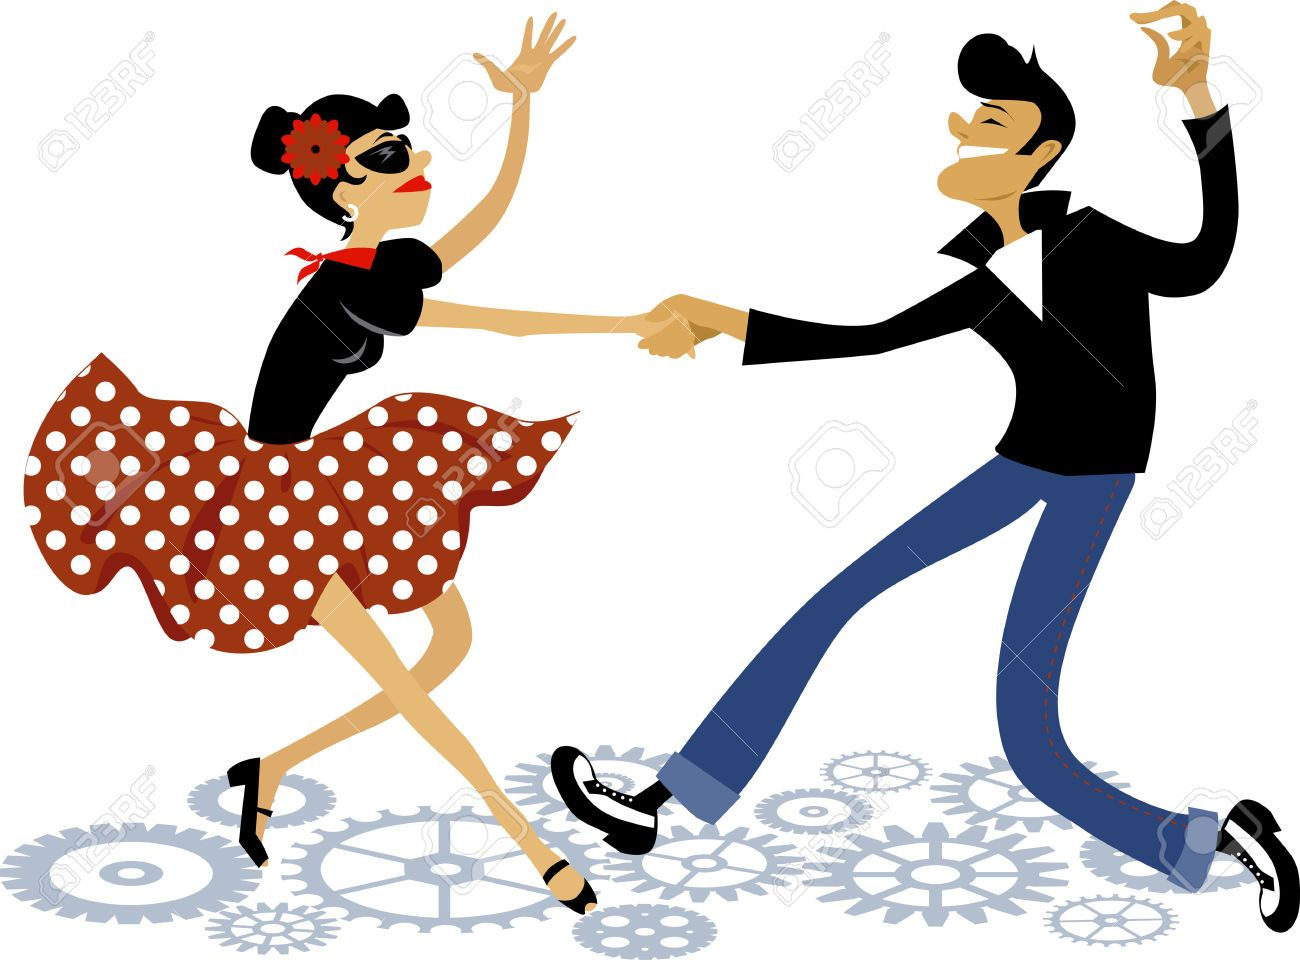 43432377 Cartoon Couple Dressed In Rockabilly Style Fashion Dancing Rock Stock Photo Jpg 1300 960 Bailar Dibujo Baile Rock Roll